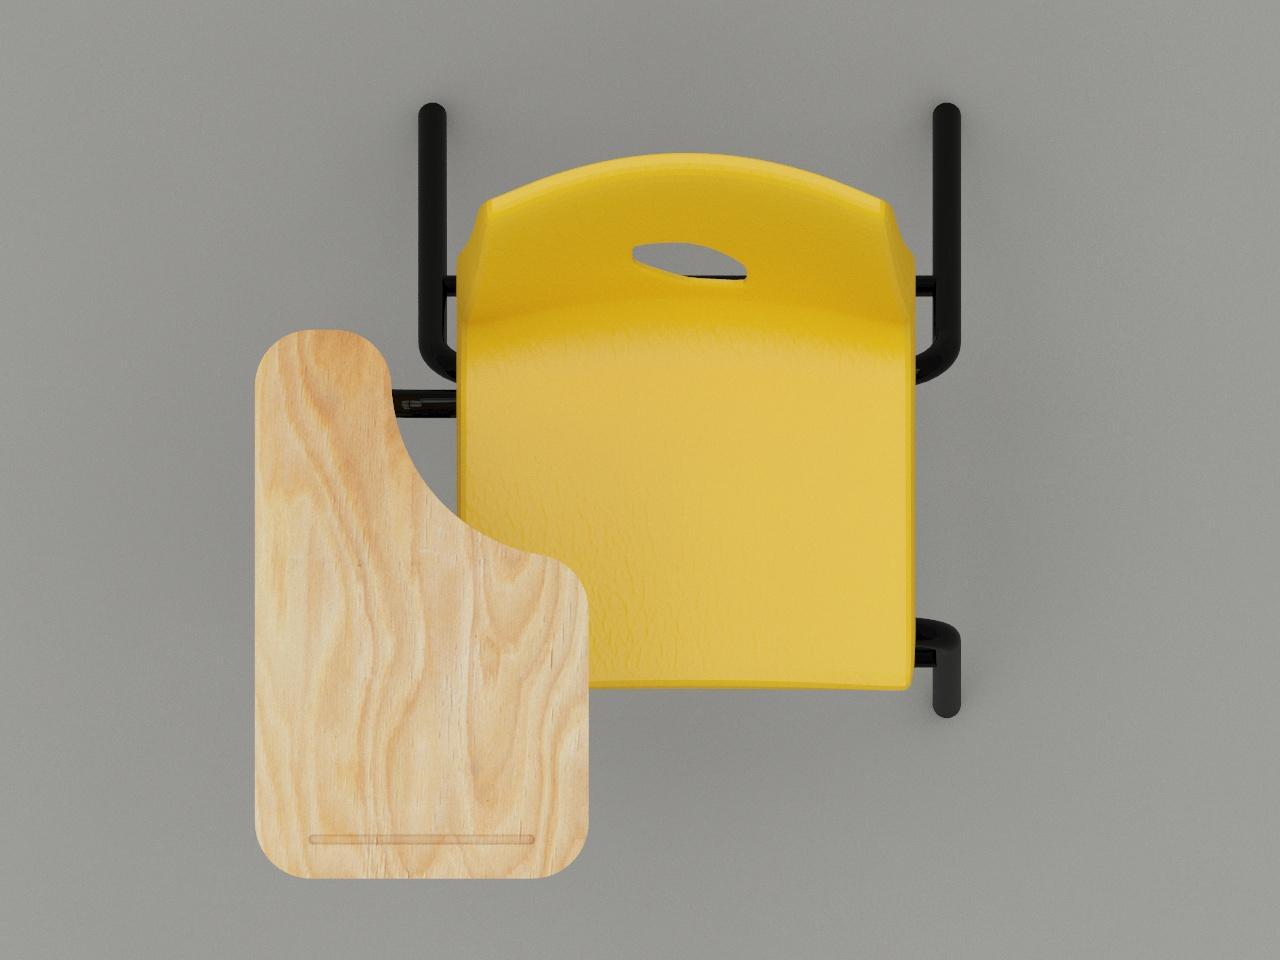 silla de paleta concha plastica color amarilla paleta de triplay